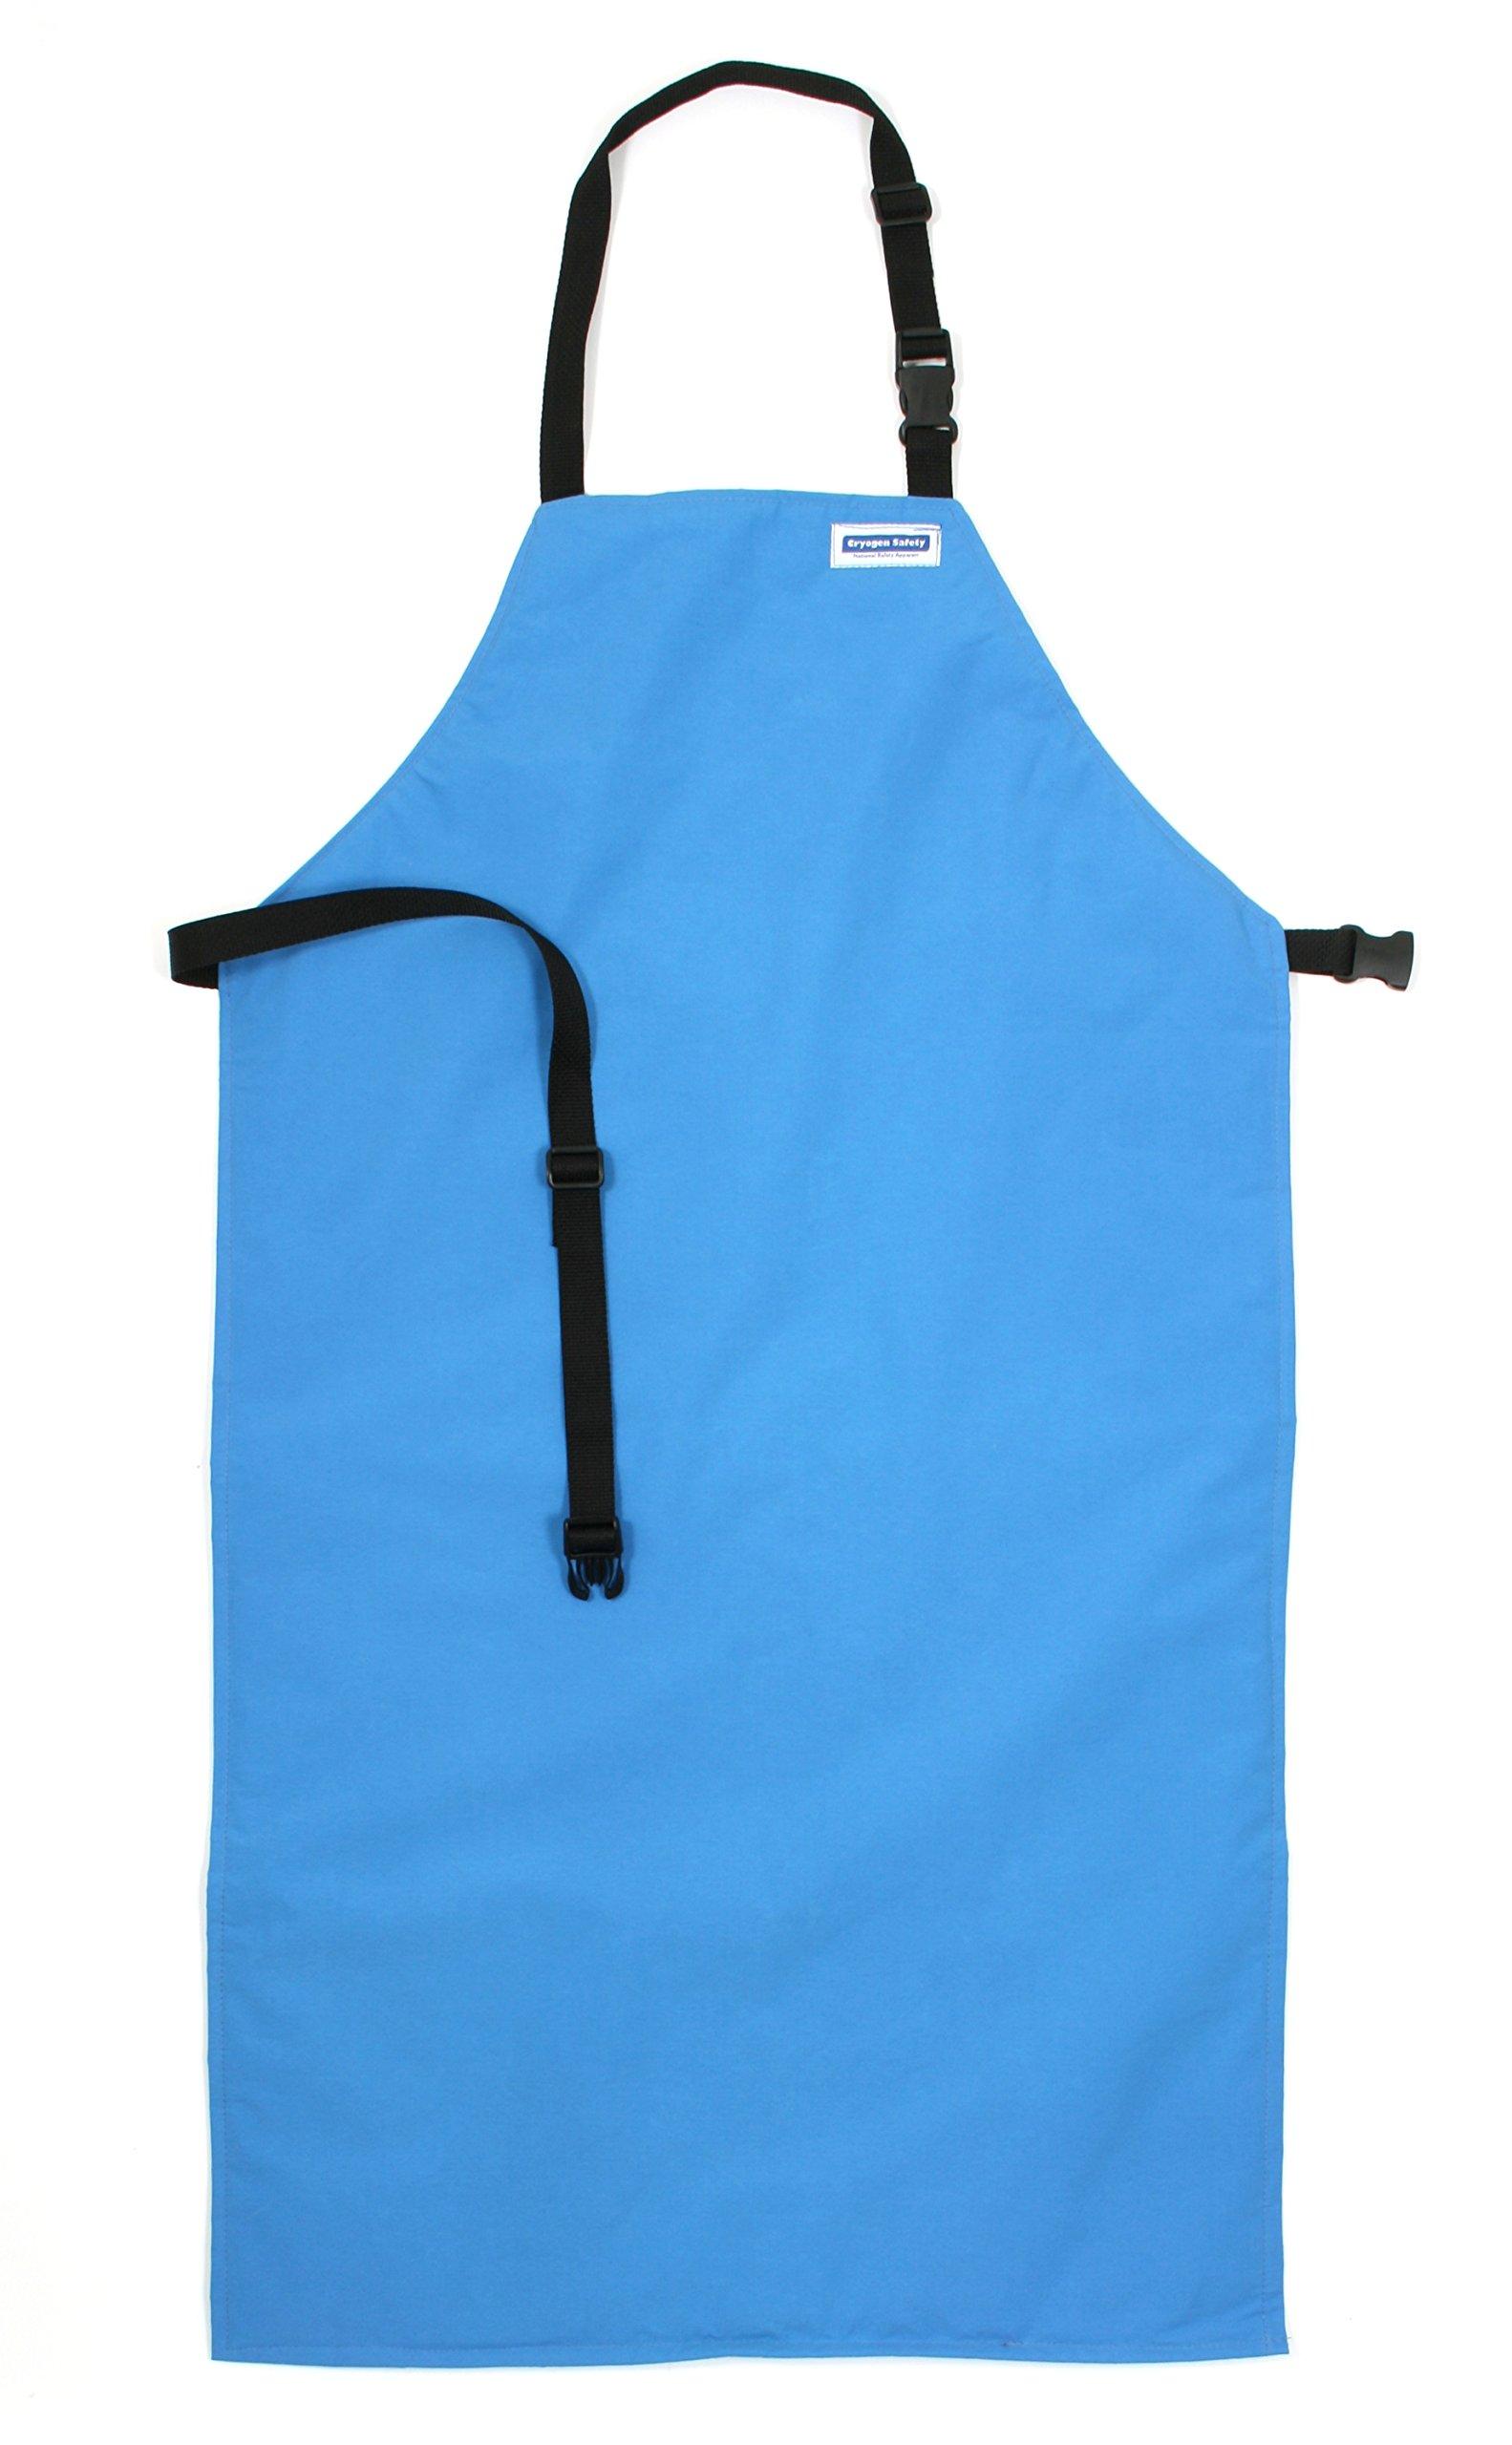 National Safety Apparel A02CRC24X42 Nylon Taslan and PTFE Waterproof Cryogenic Safety Bib Apron, 42'' Length x 24'' Width, Blue